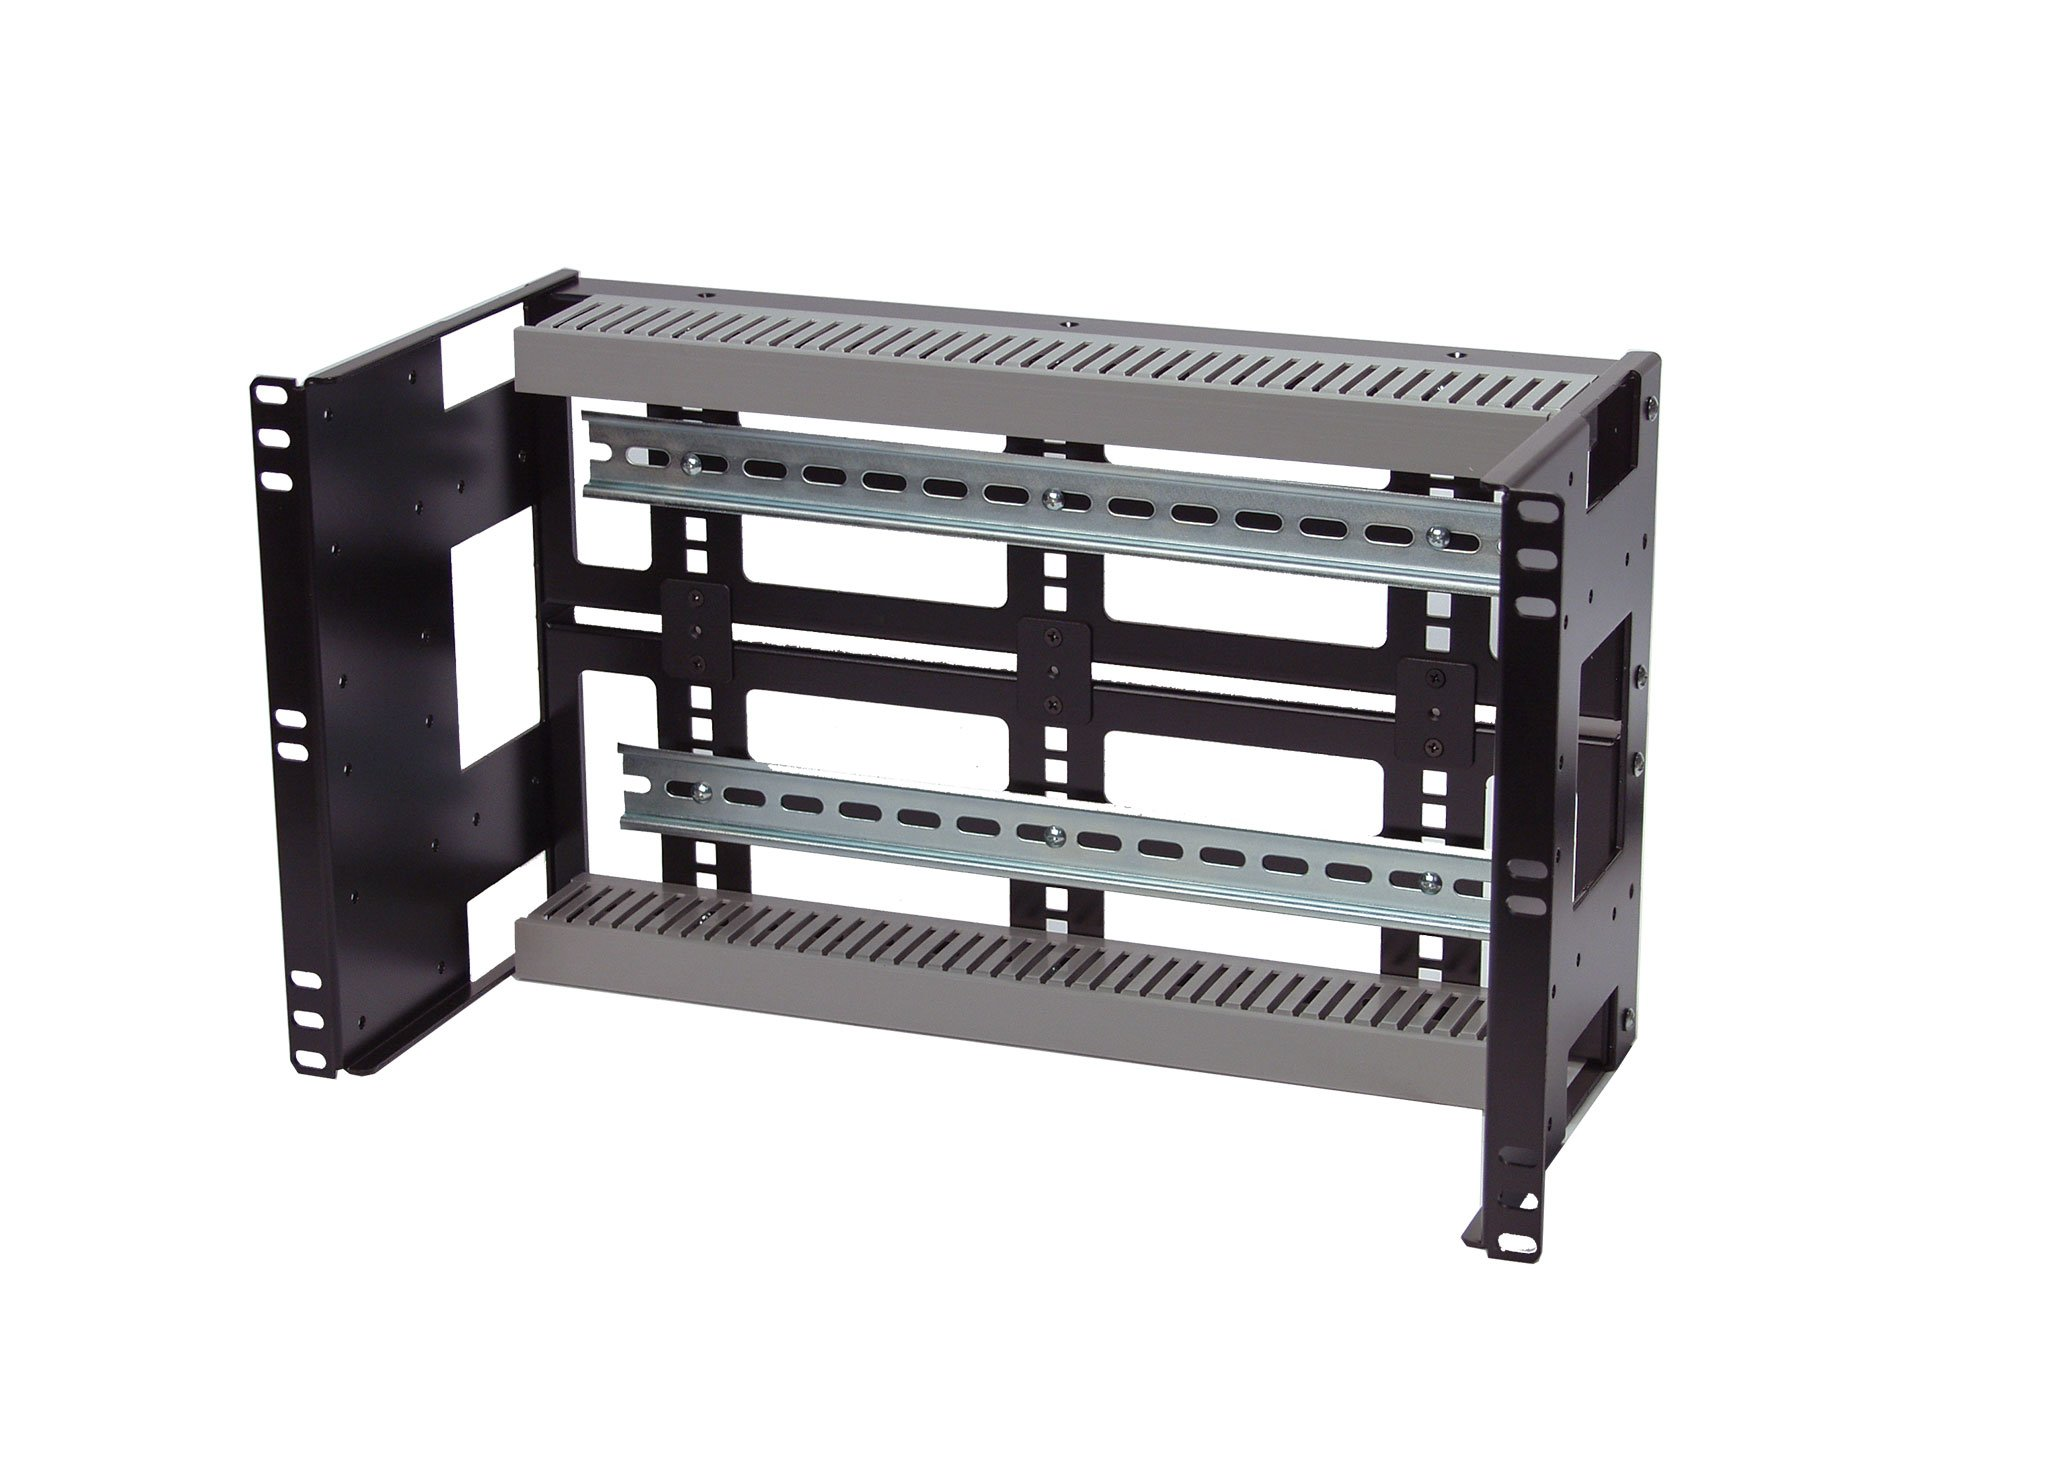 IRP0608D10 Rackmount 6U Compact 8'' Deep Din Rail Panel for 19'' 2-Post or 4-Post Rack